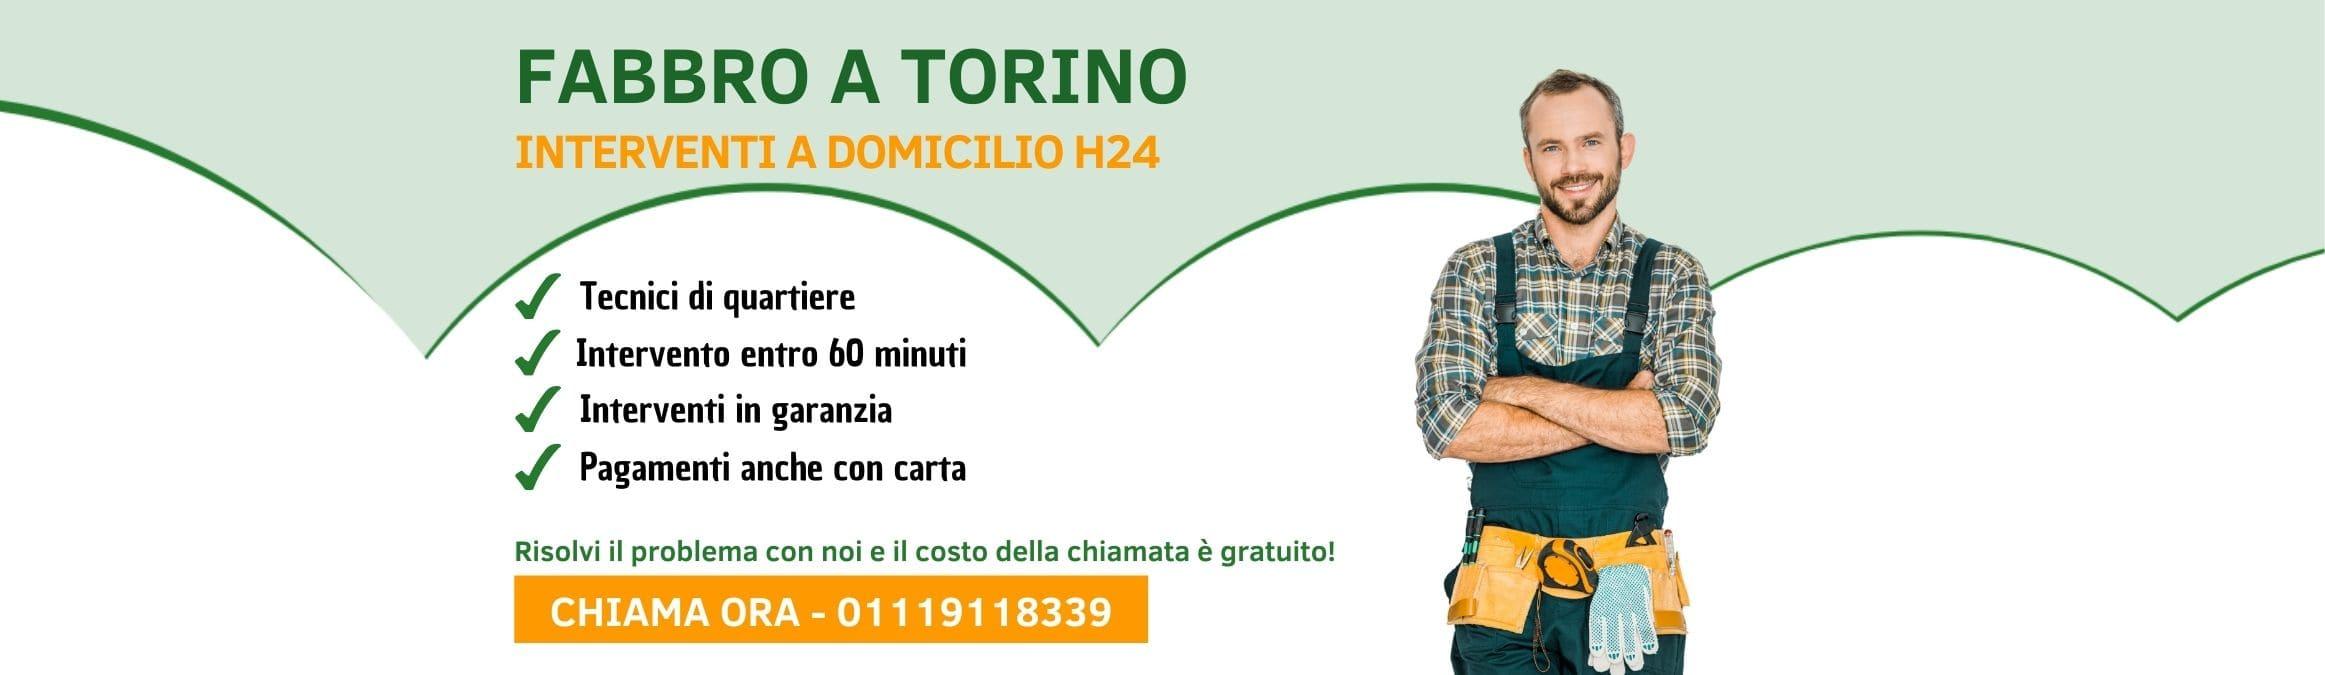 Fabbro Torino - Pronto intervento h24